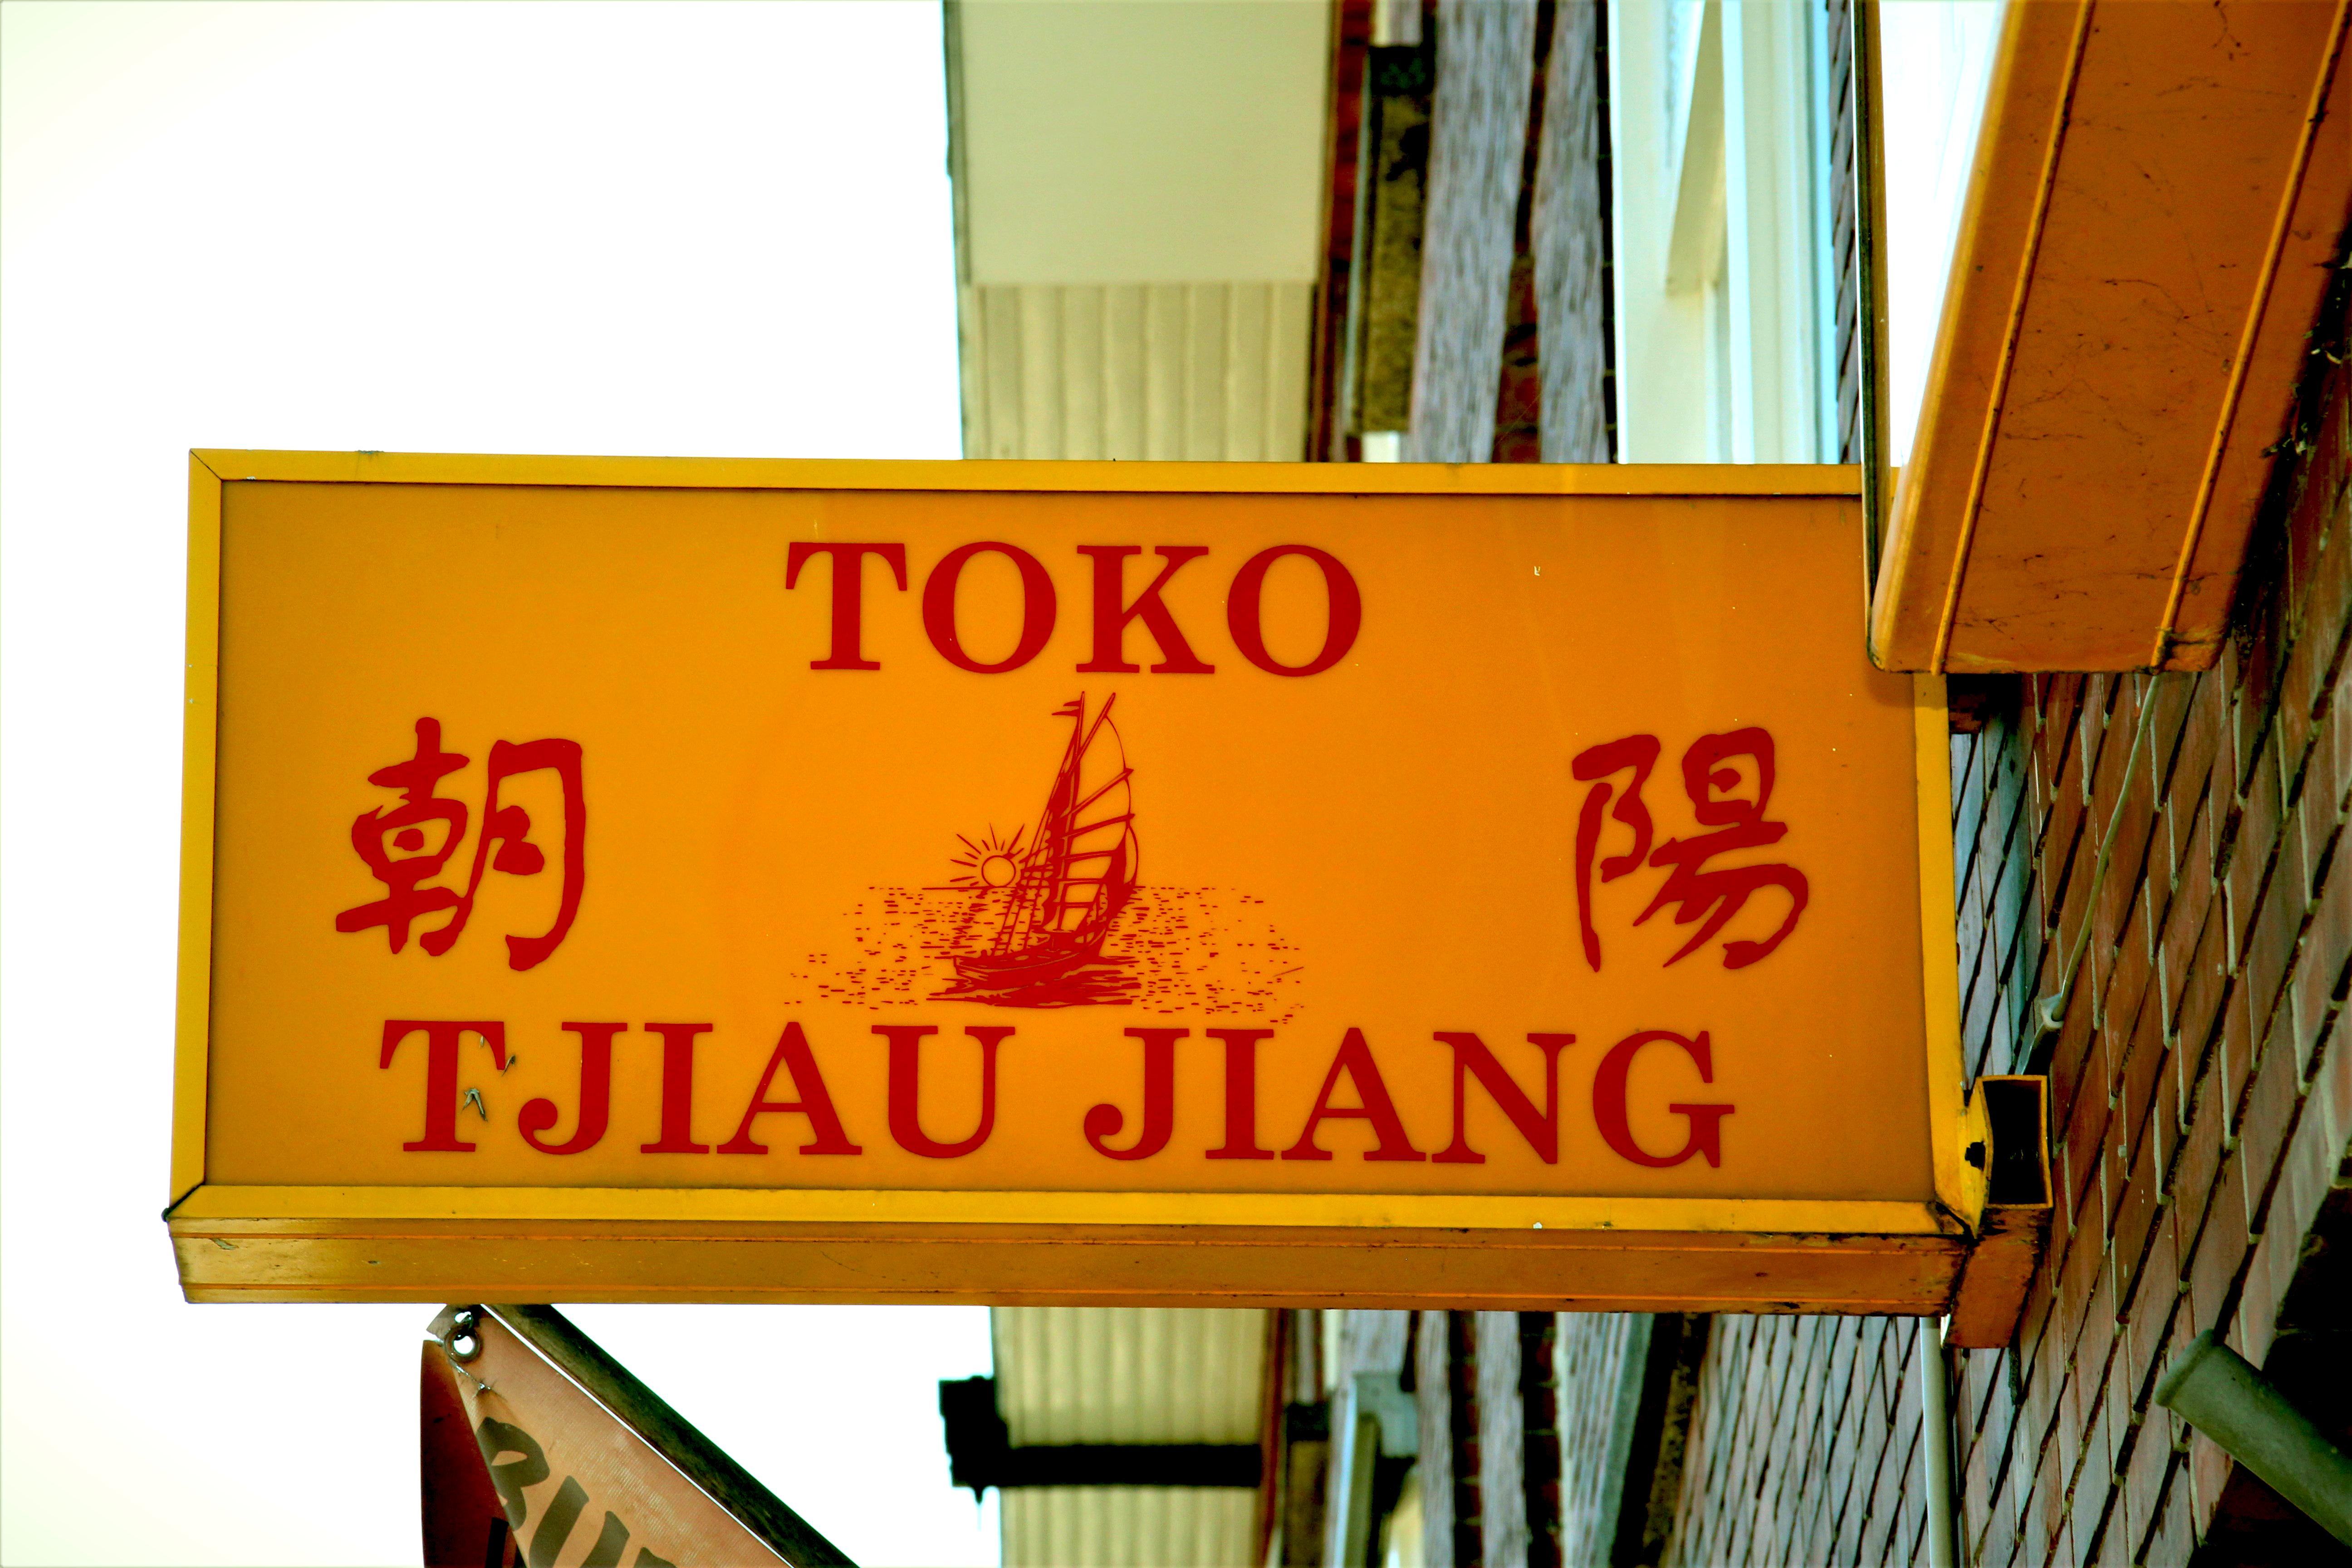 Logobord van Toko Tjiau Jiang Utrecht